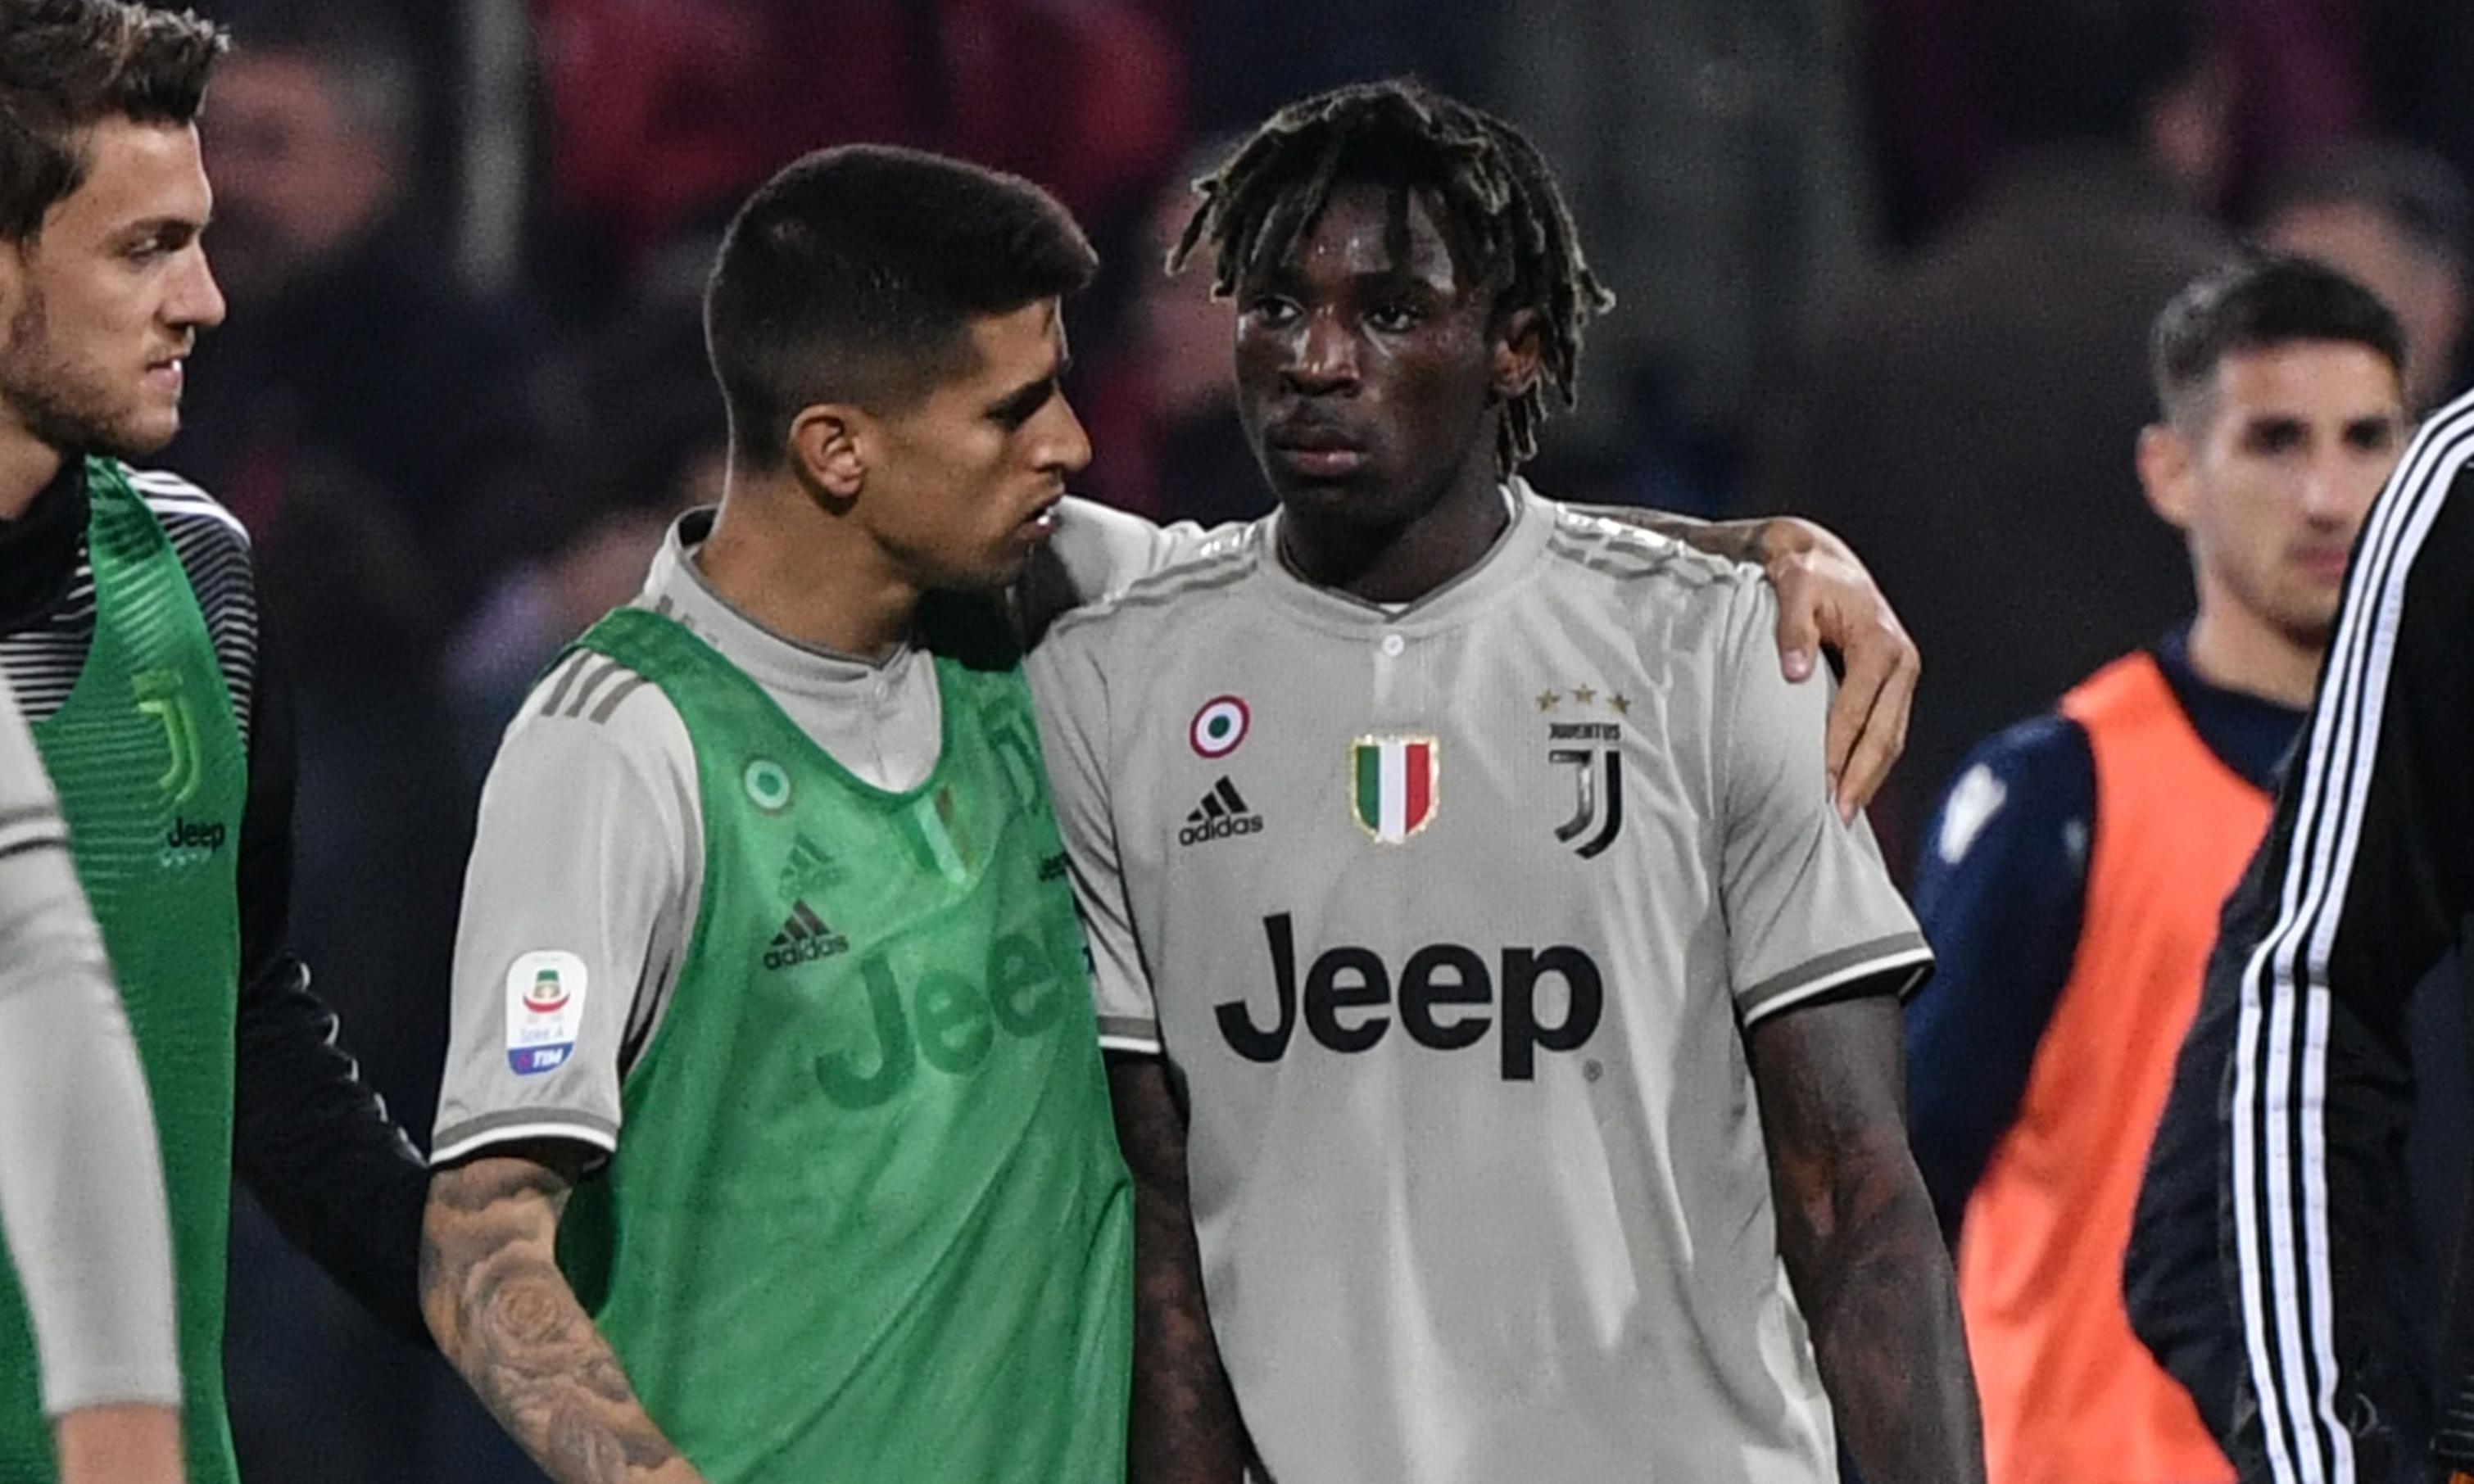 Cagliari escape punishment over racist abuse directed at Moise Kean